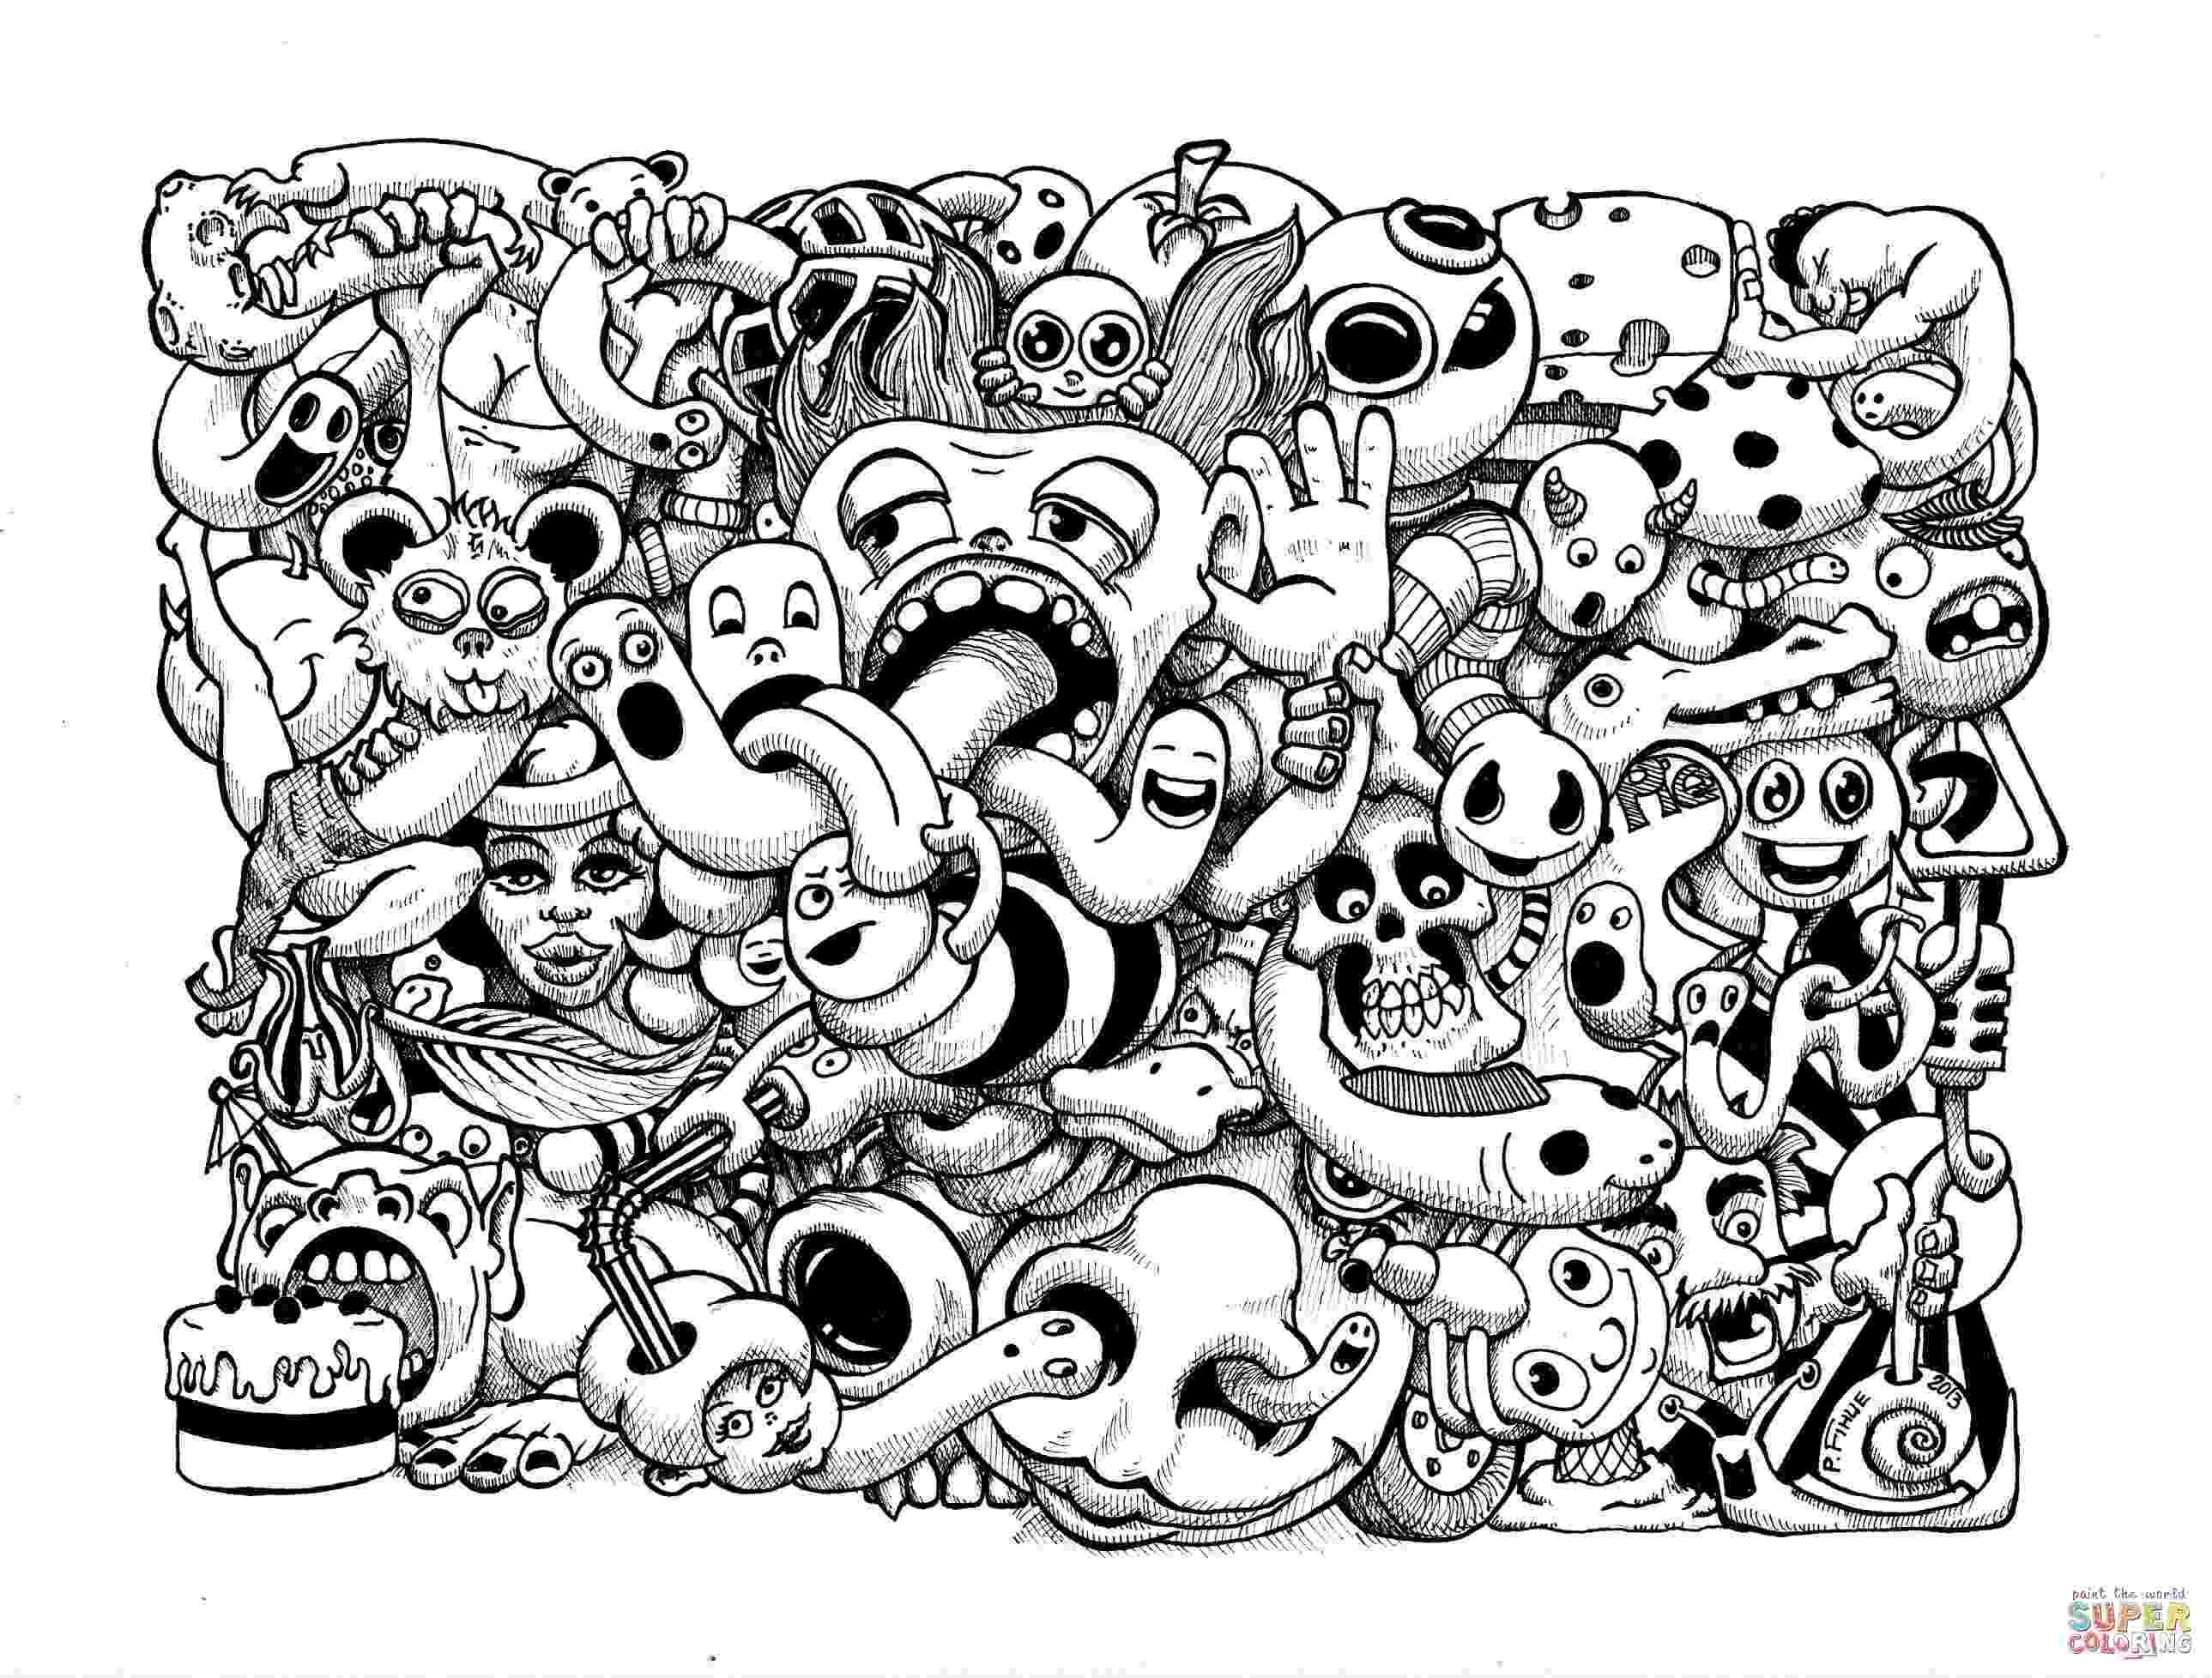 doodle art coloring book doodle art a leisurely analysis coloring book art doodle